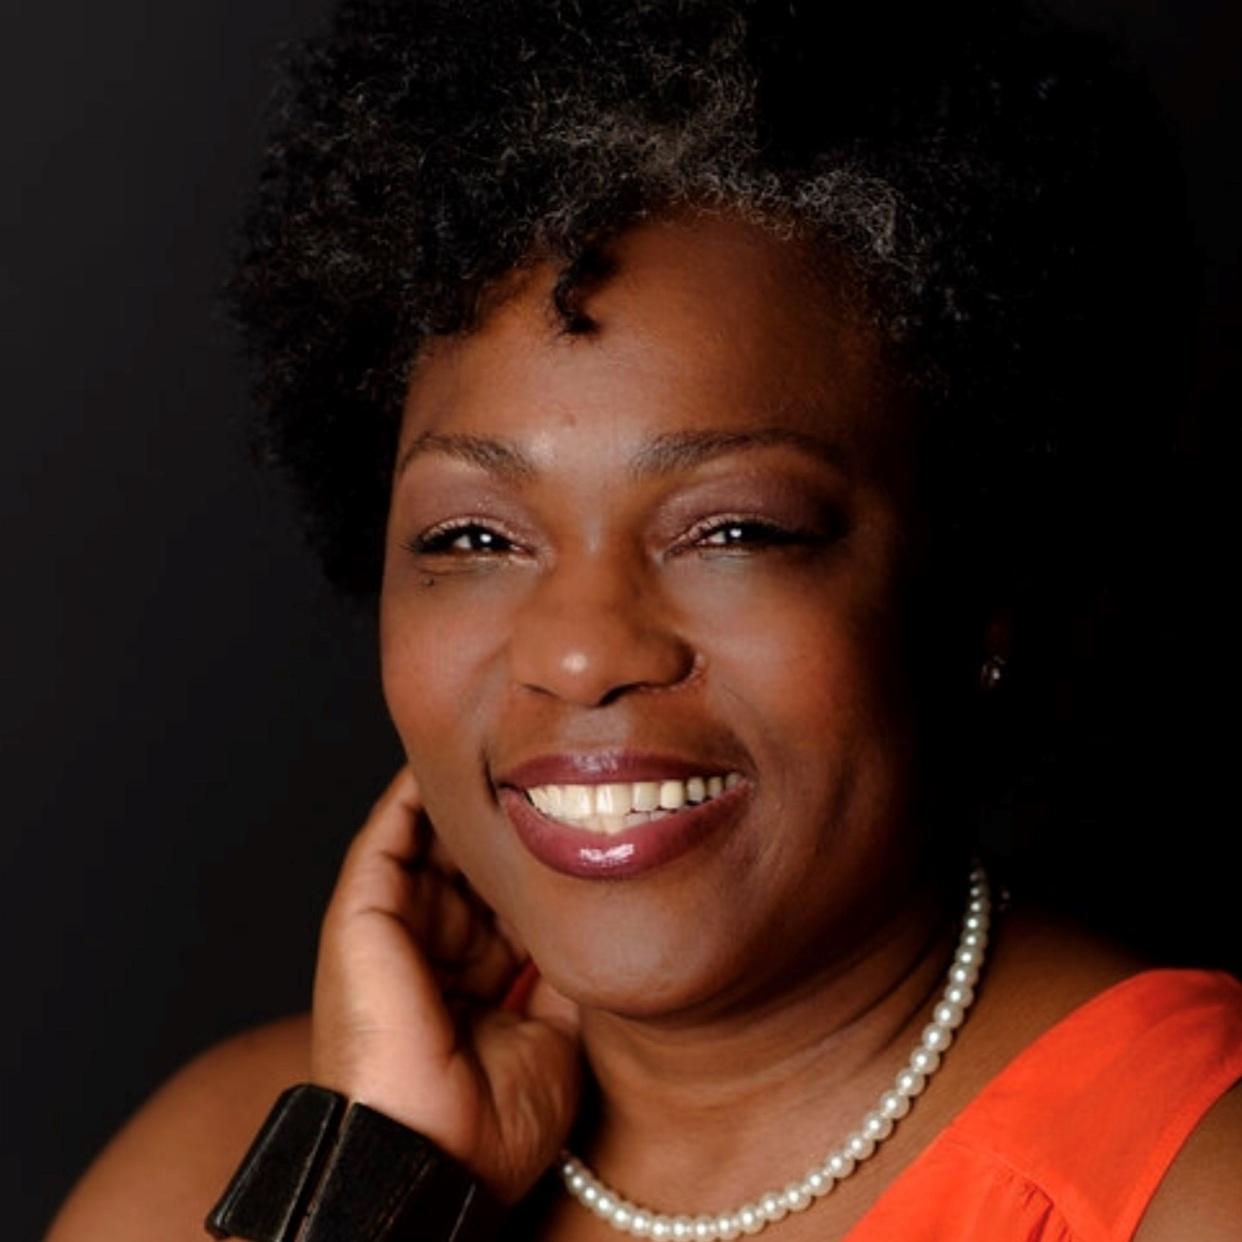 YolandaJOhnson - Event Host | Owner, Facilitator Beyond Measure, LLC